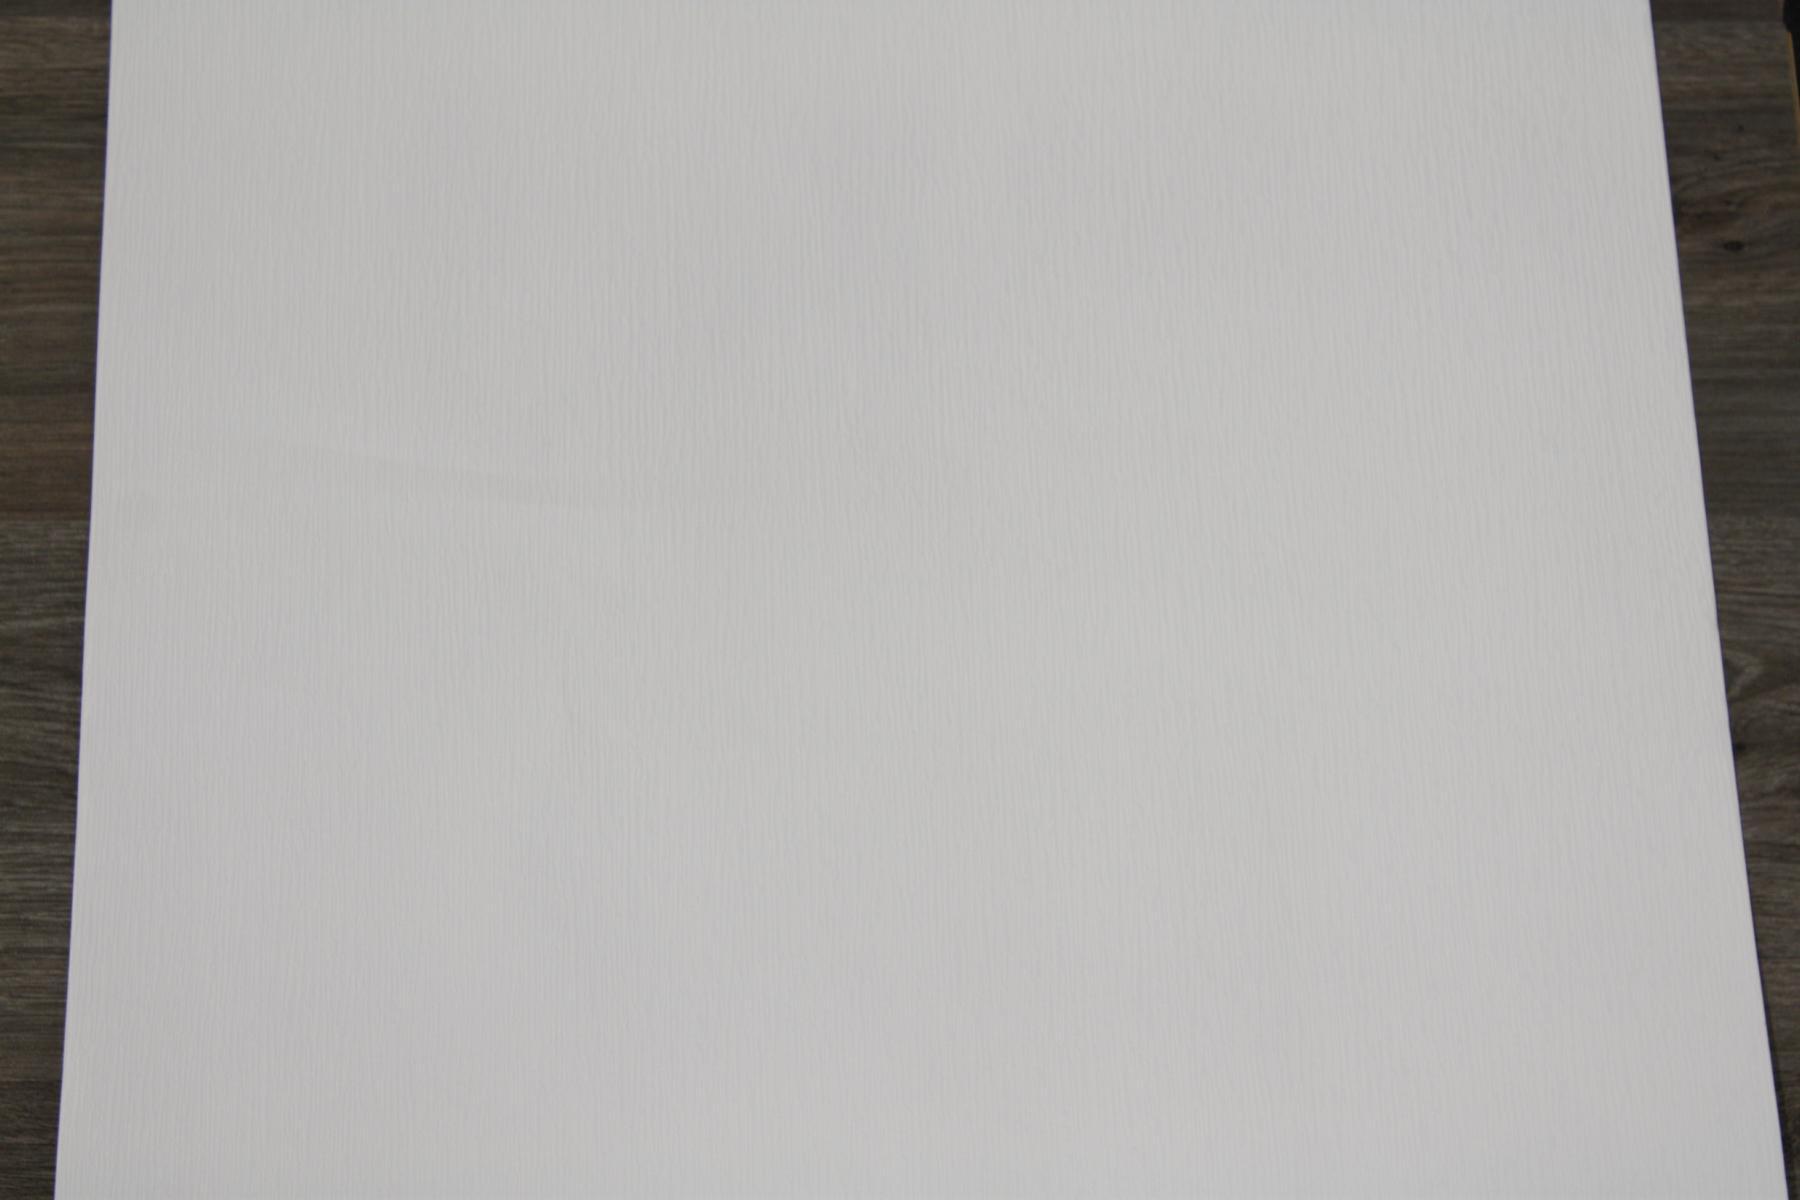 Tapete Rasch 863901 Home Vision Streifen hell grau